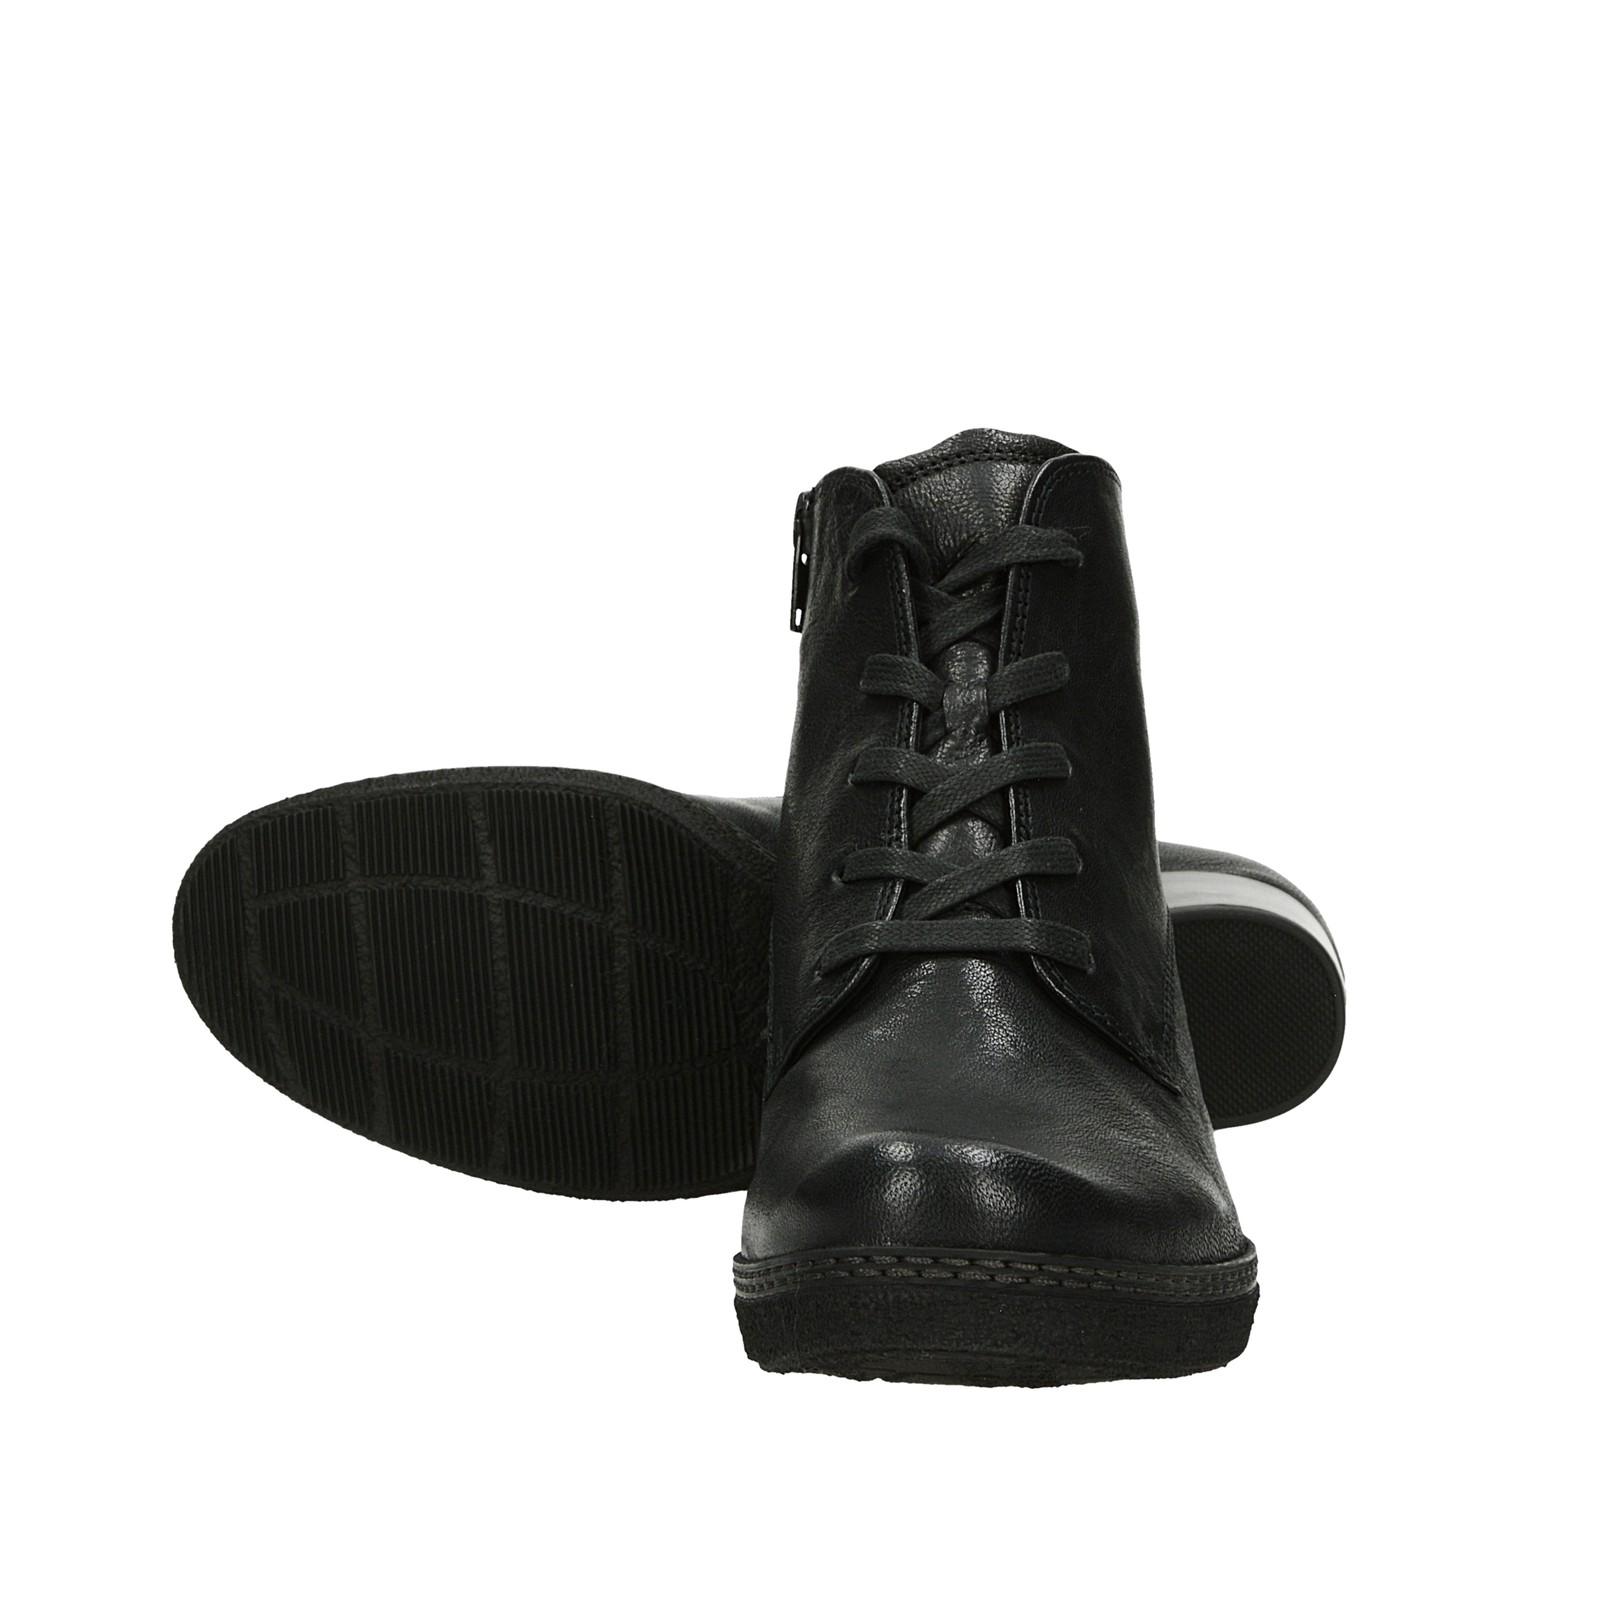 Gabor dámské kožené kotníkové boty - černé ... e73fd3fddc